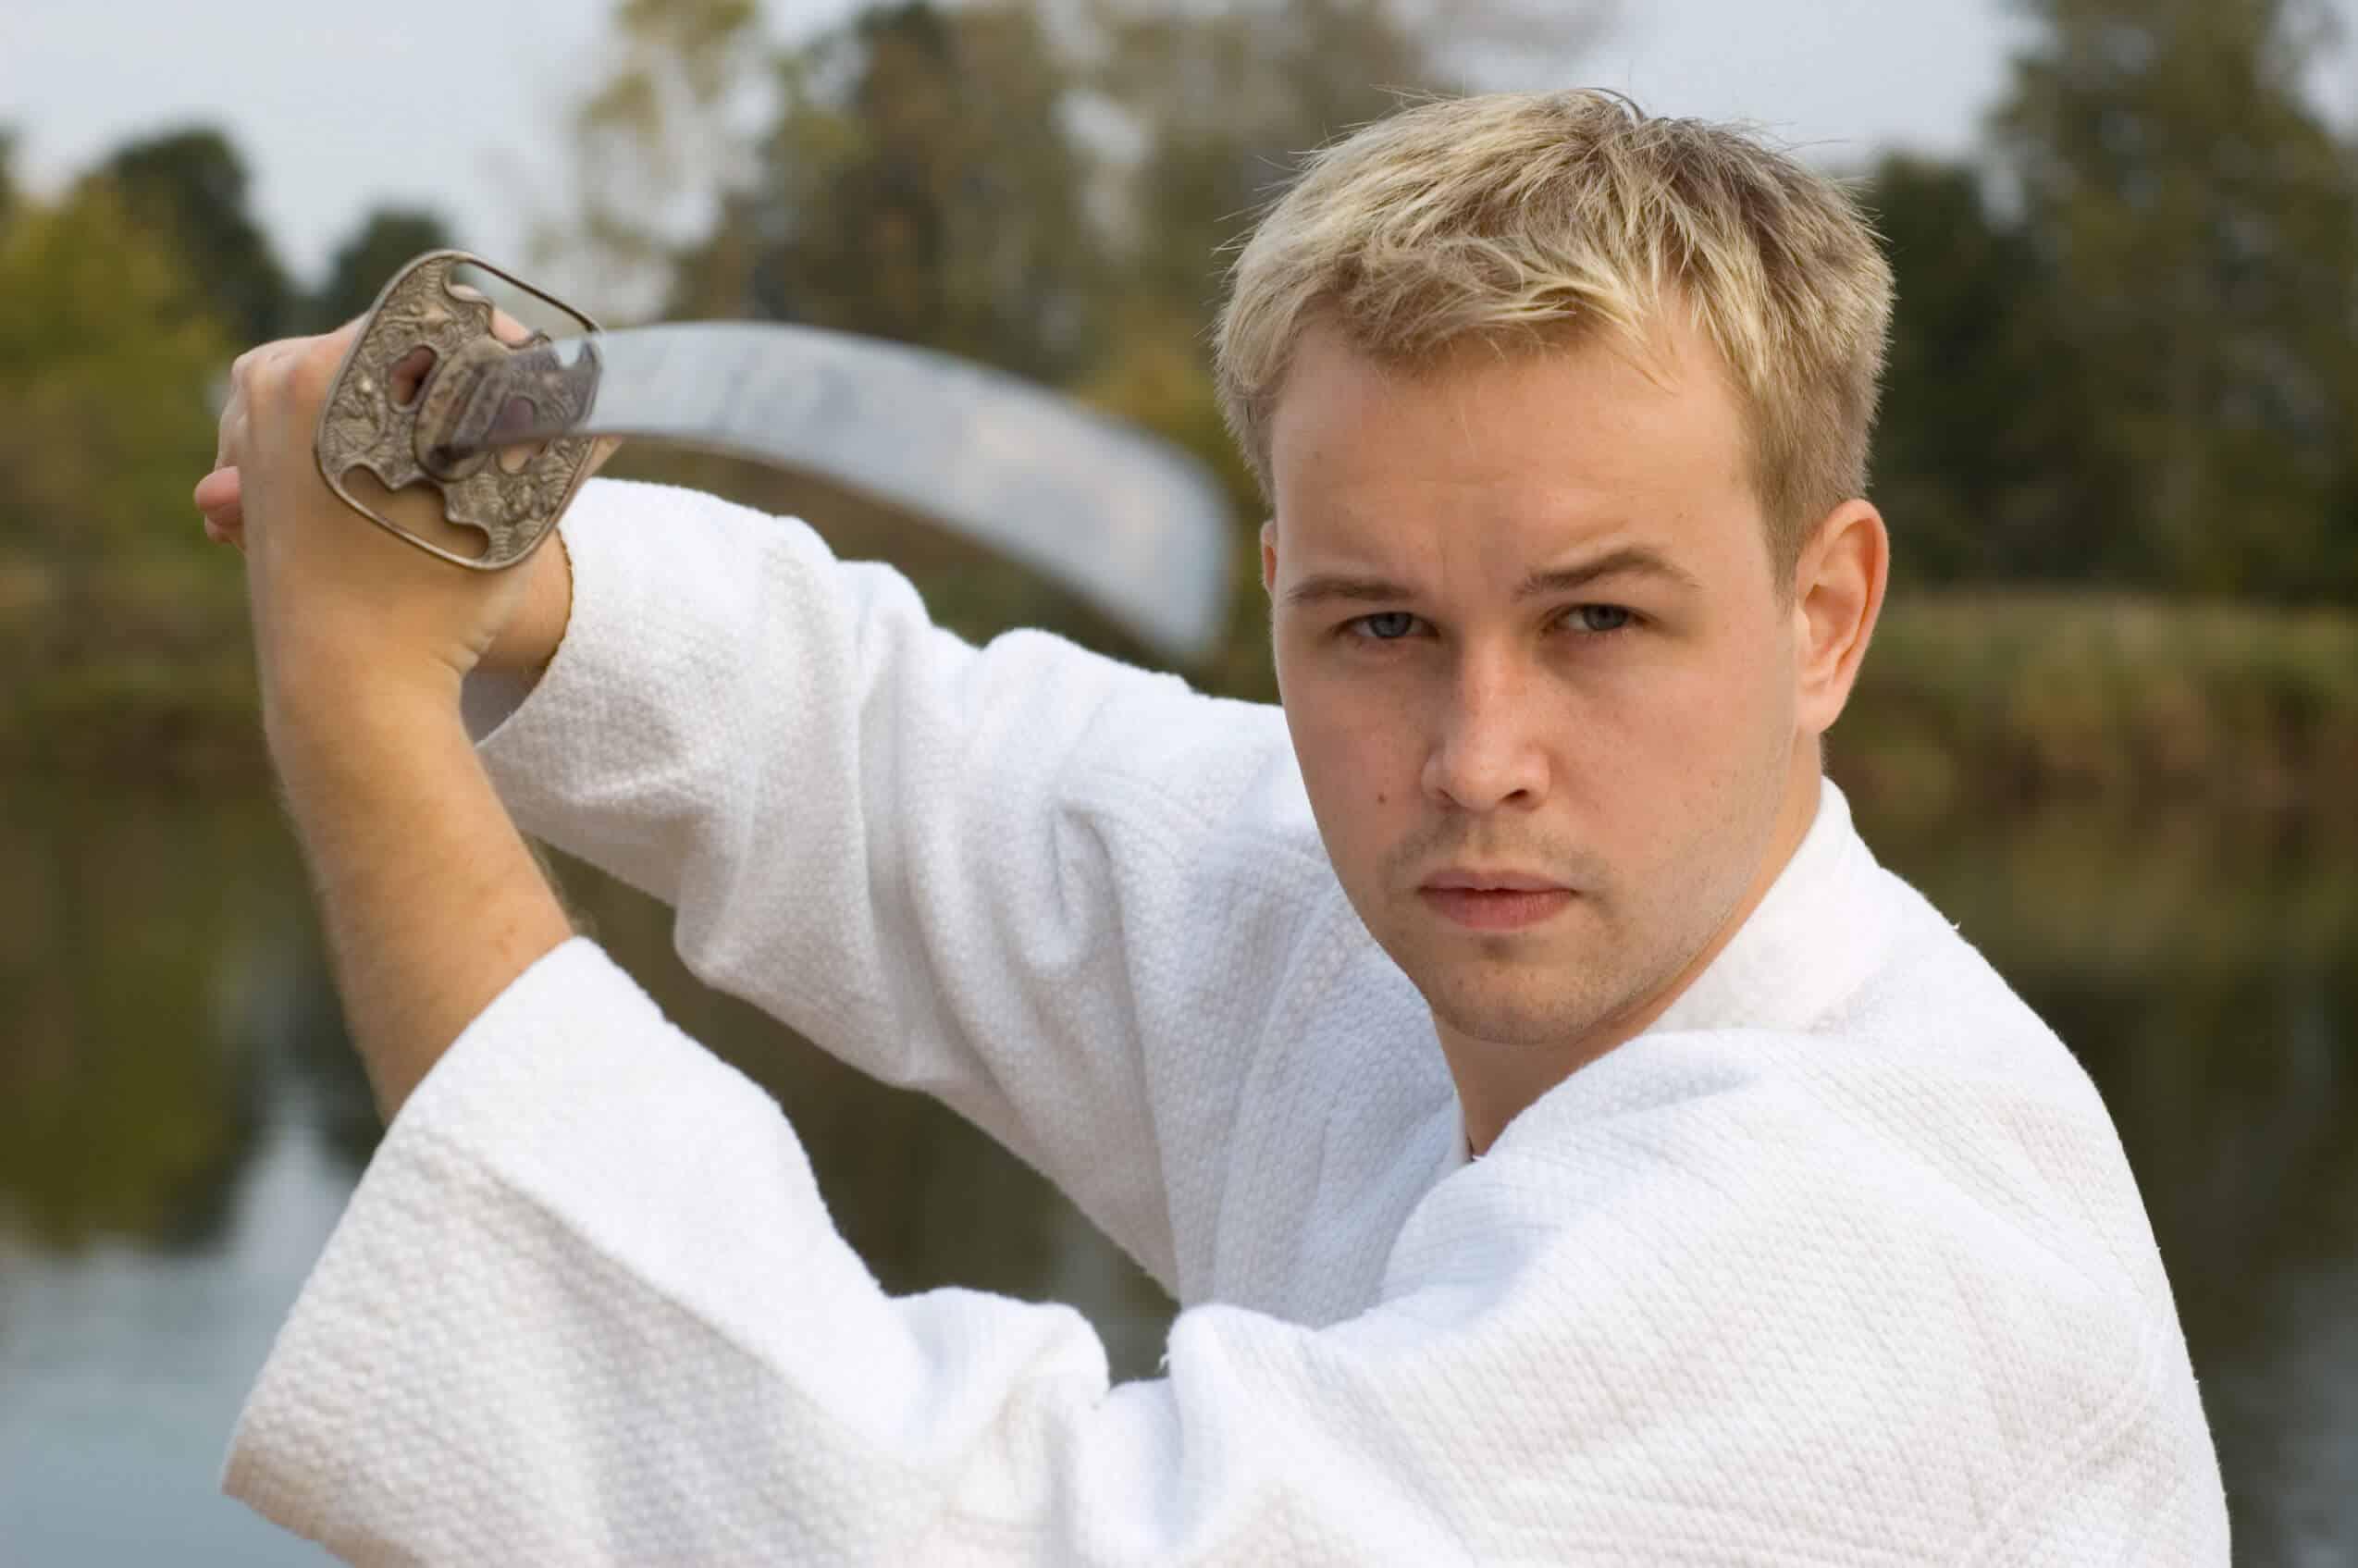 Martial Arts Lessons for Adults in Carmichael CA - Samurai Sword Posing Blog